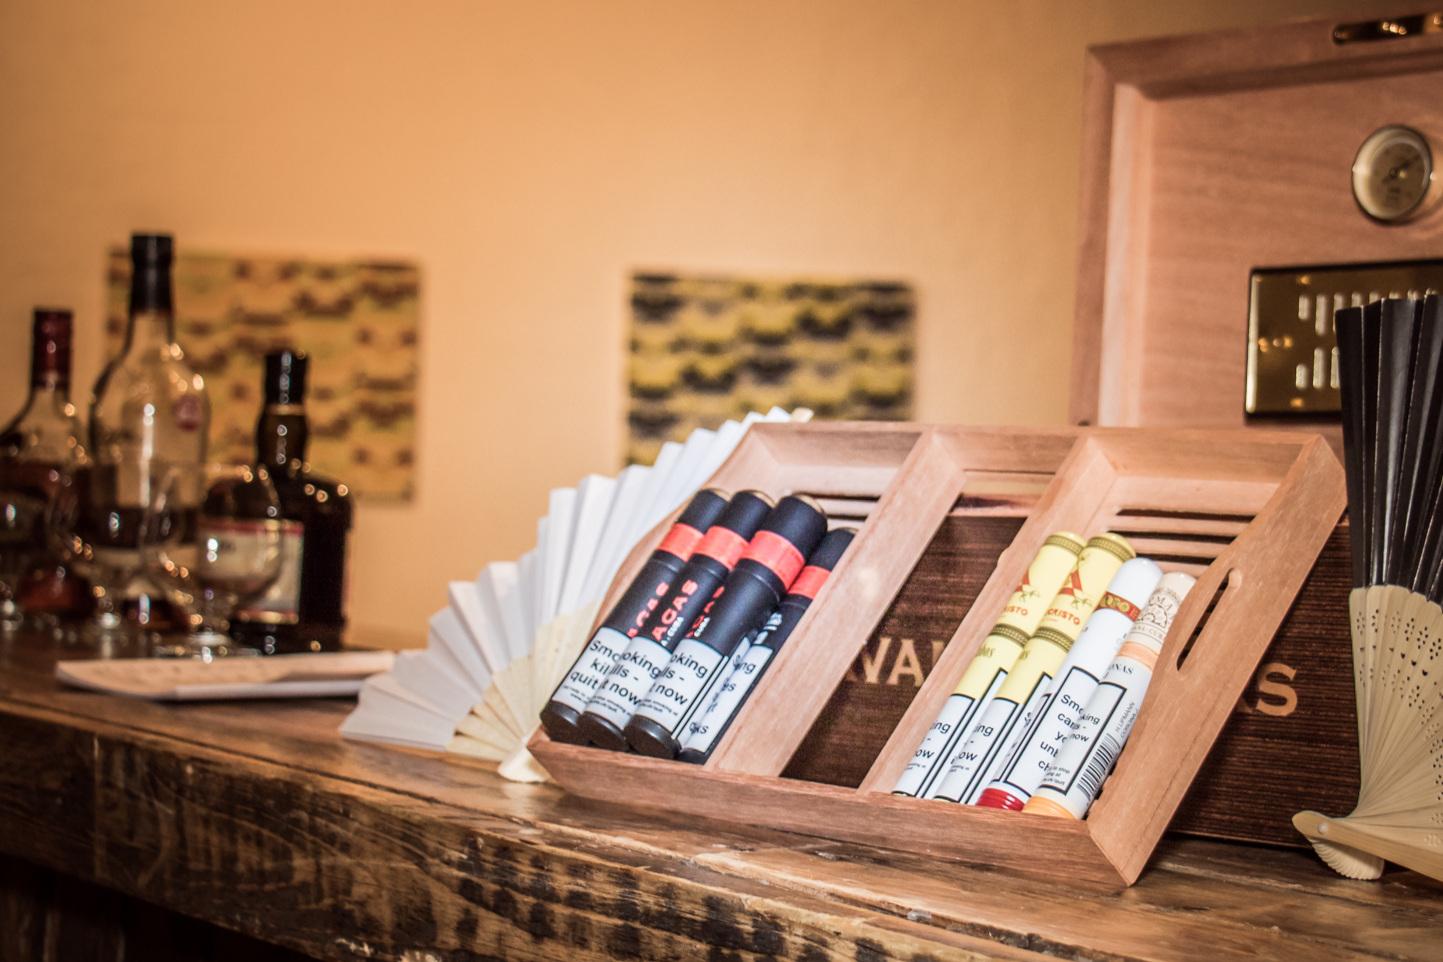 Enjoy an authentic Cuban at our secret cigar bar?